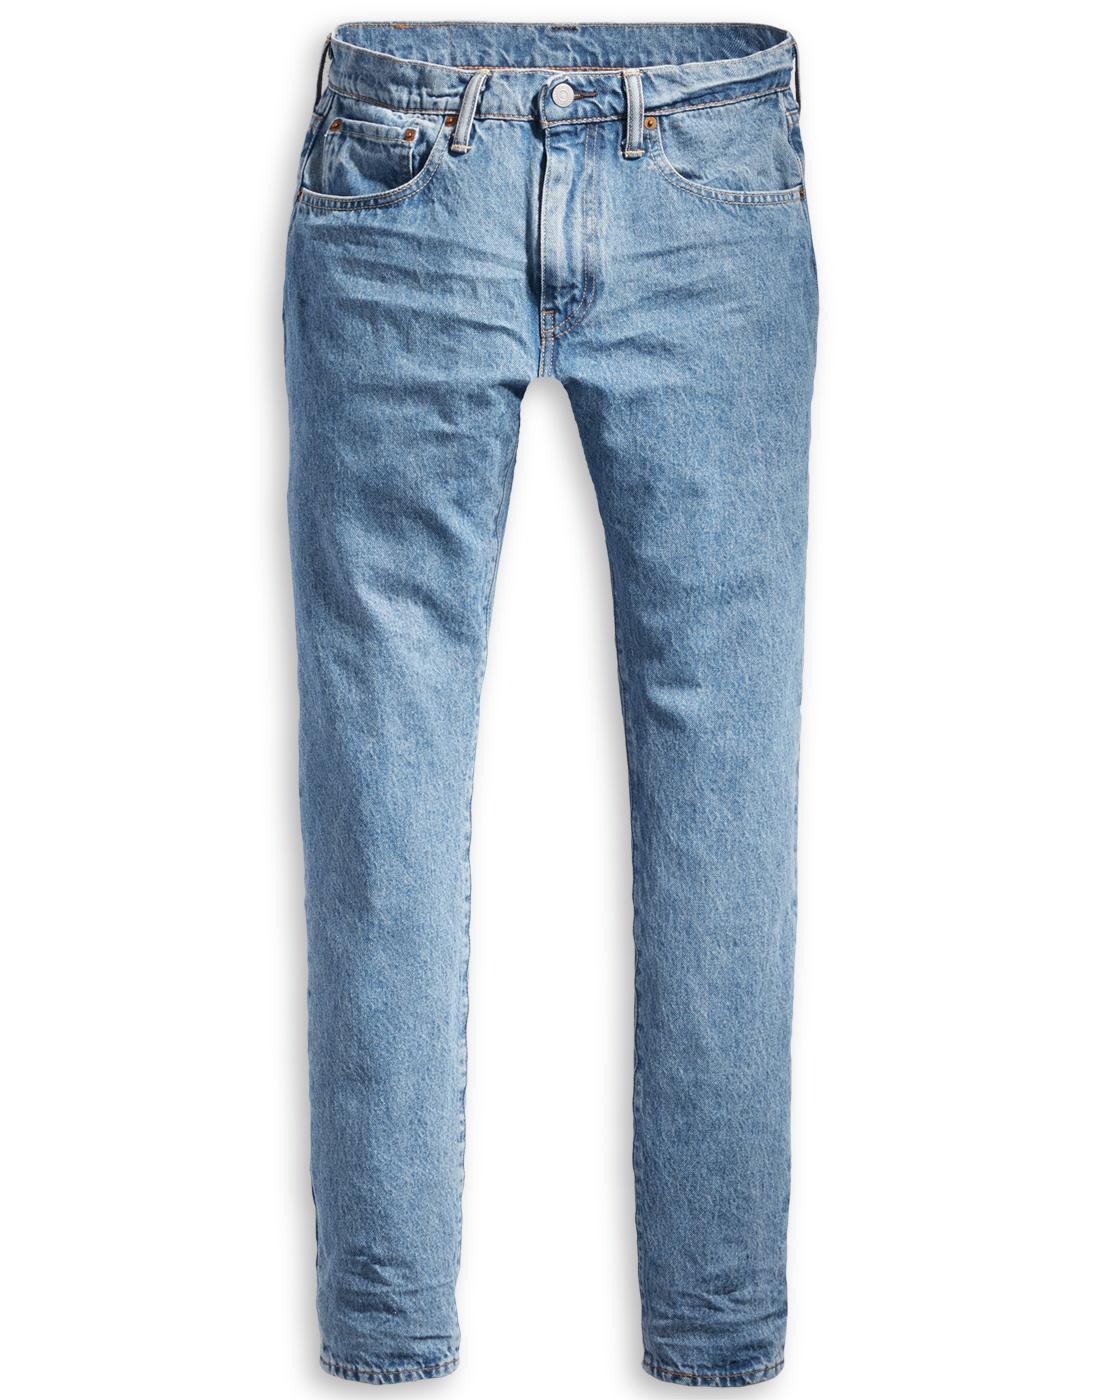 LEVI'S 512 Slim Taper Fit Denim Jeans STONED POPPY